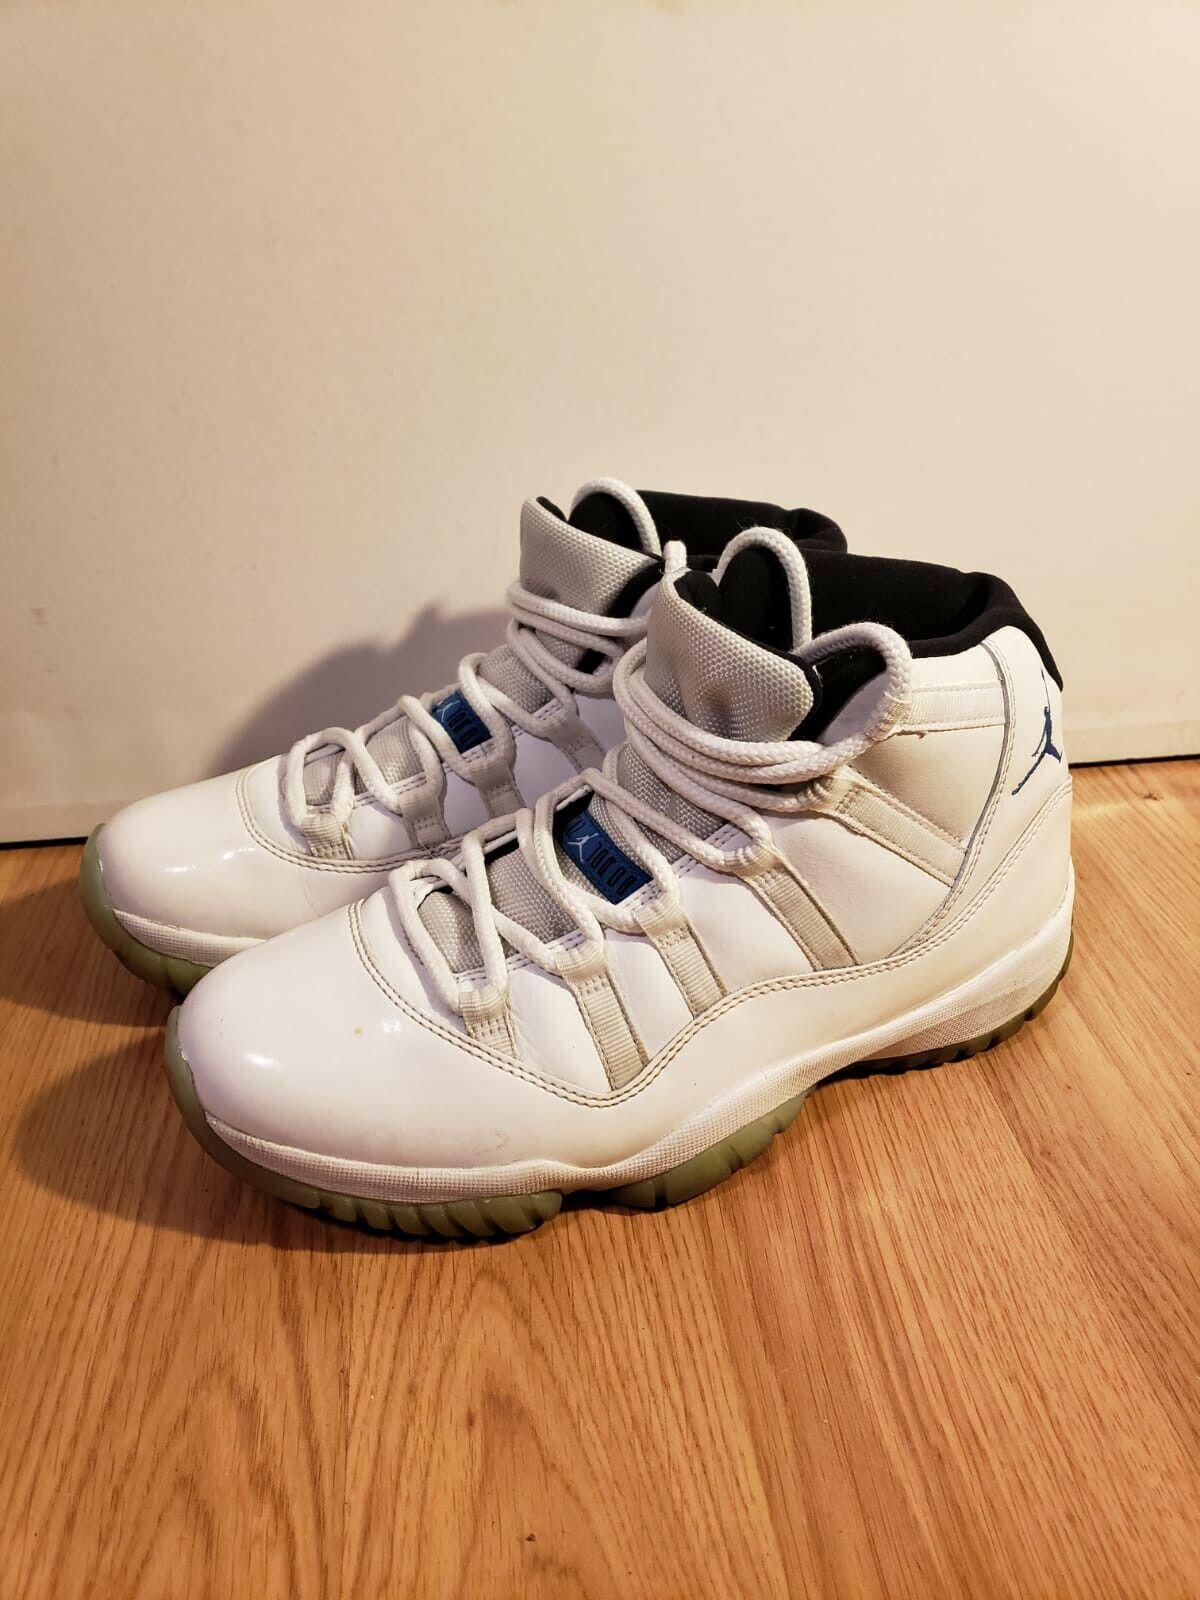 Jordan 11 Retro Legend Blau 378037-117 Größe 8.5